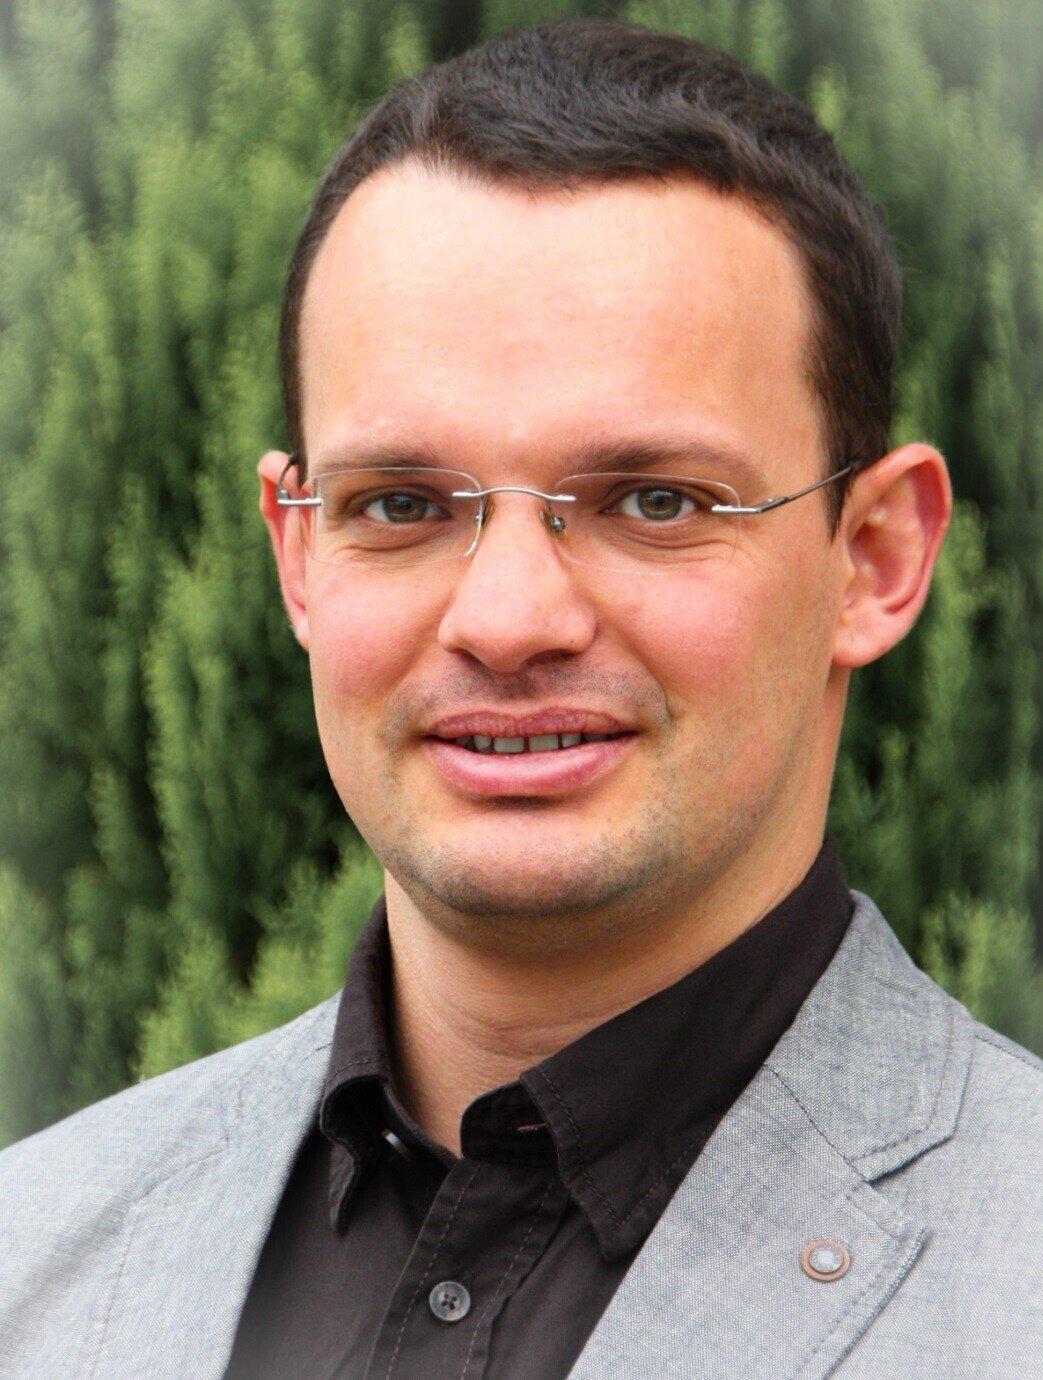 Kurt Seebauer